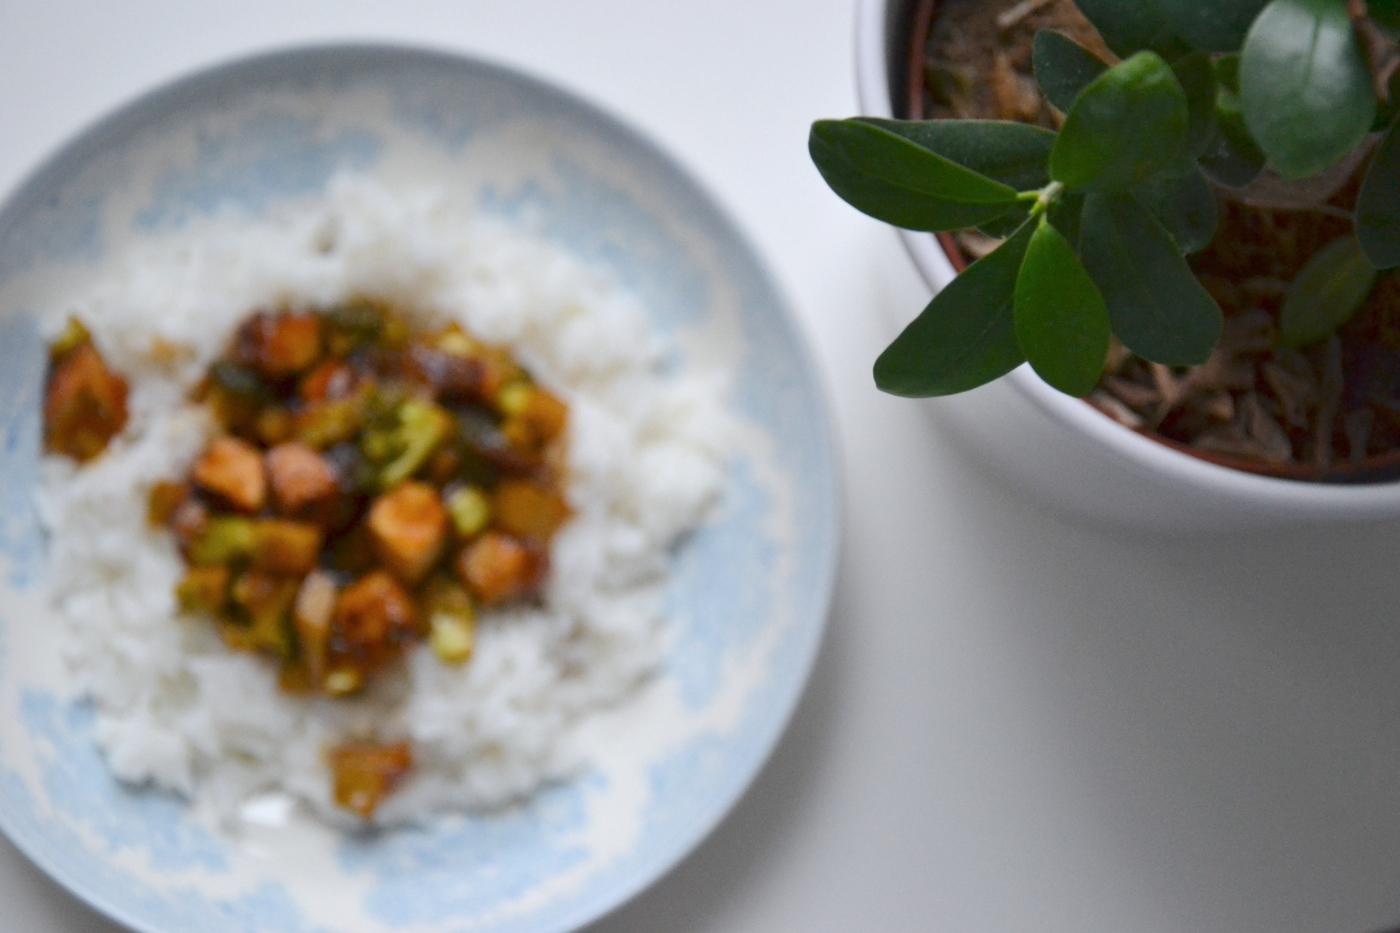 Tofubroccolipaistos